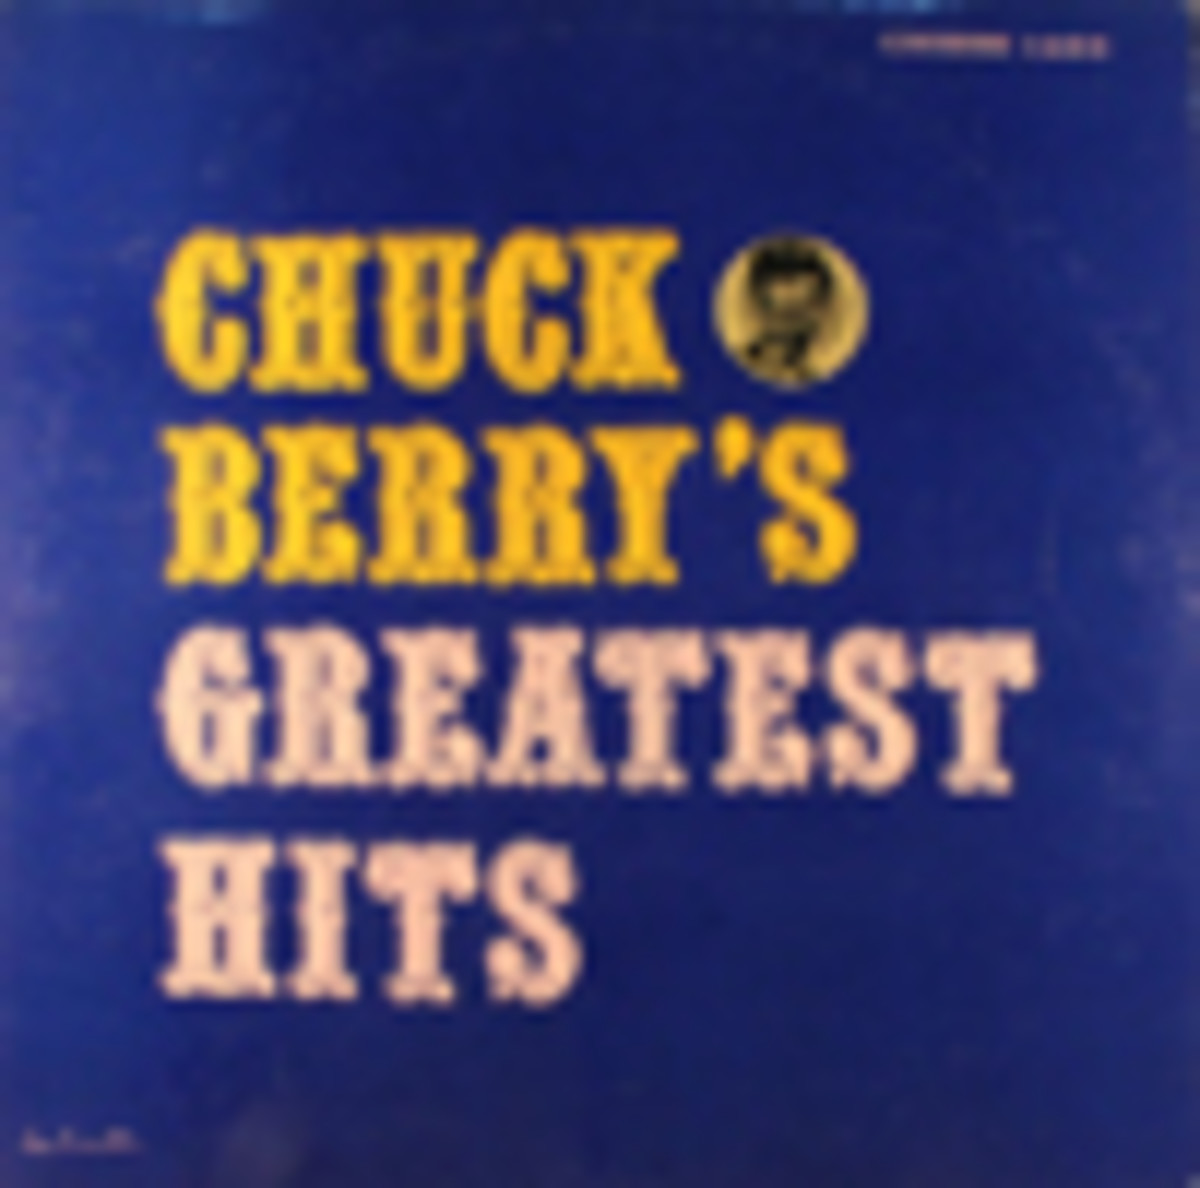 ChuckBerry_GreatestHits